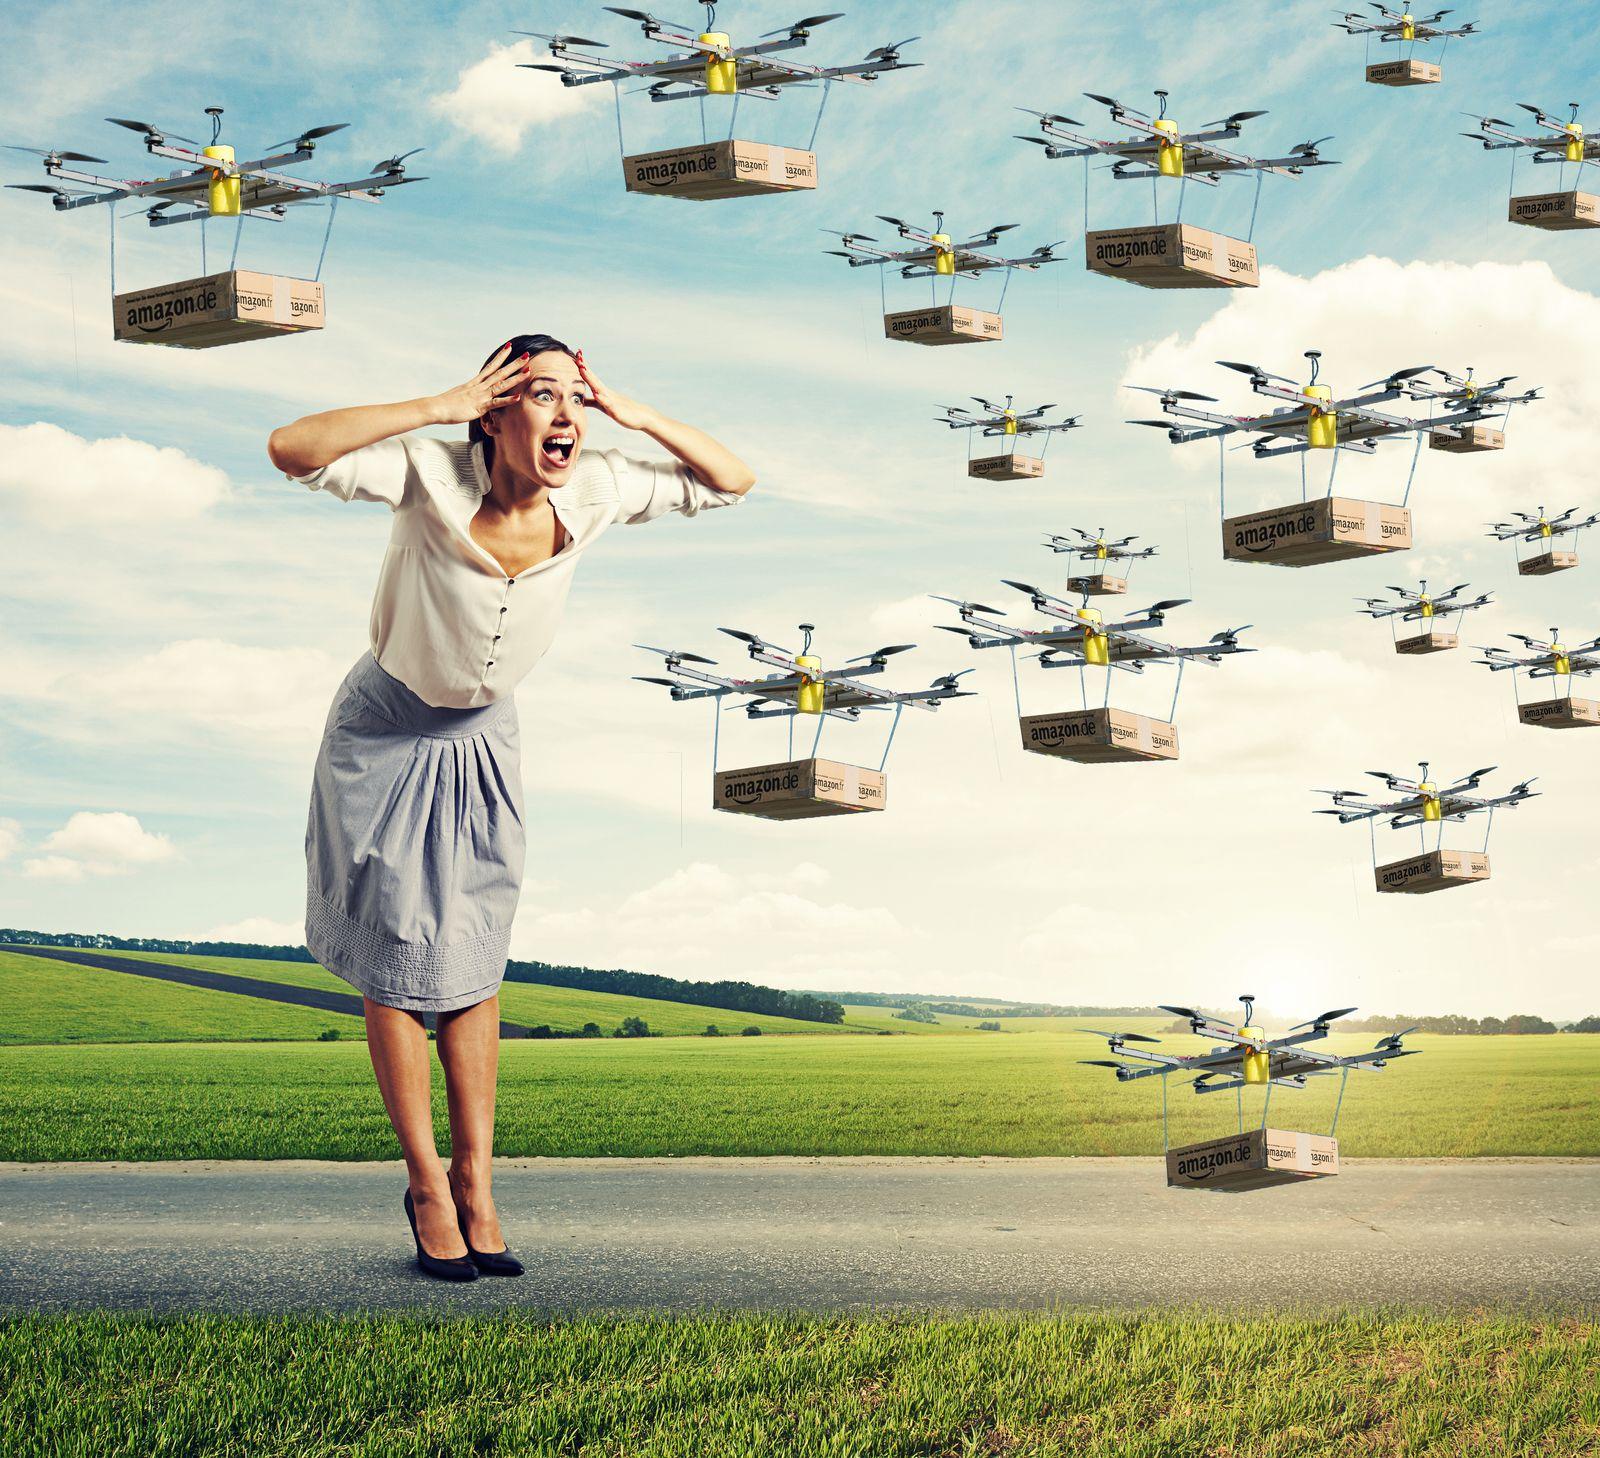 MONTAGE Panik / panische Frau Drohnen / Amazon